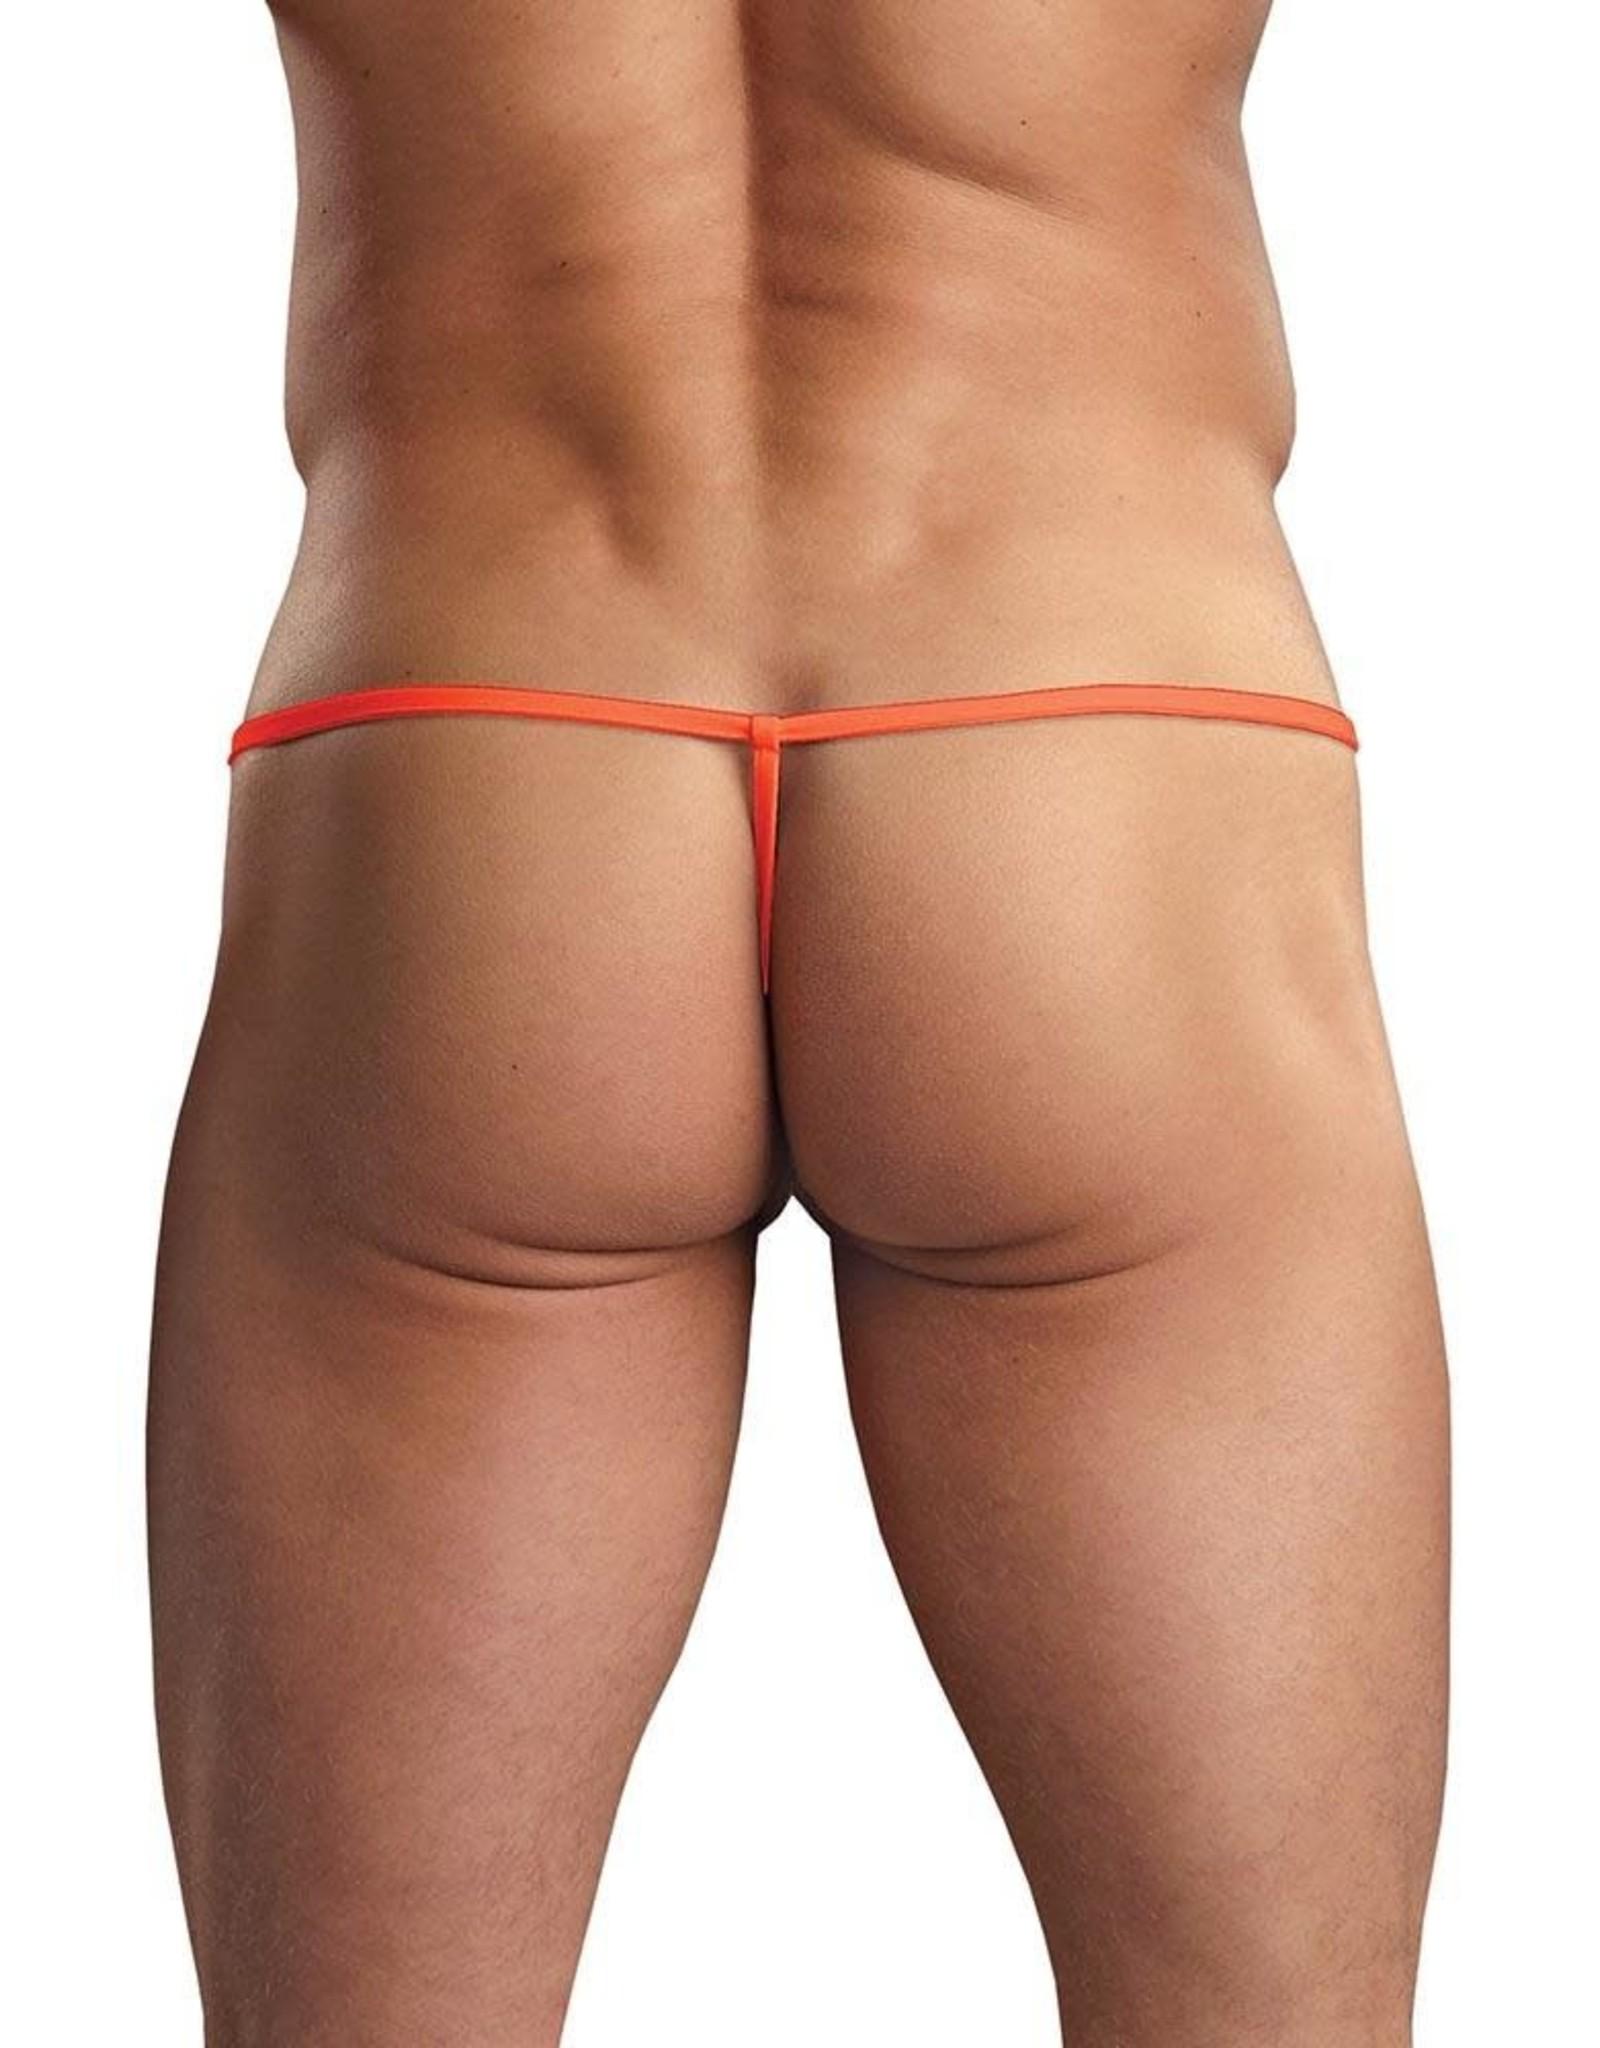 Male Power - Euro Male Pouch G-String - Orange - S/M